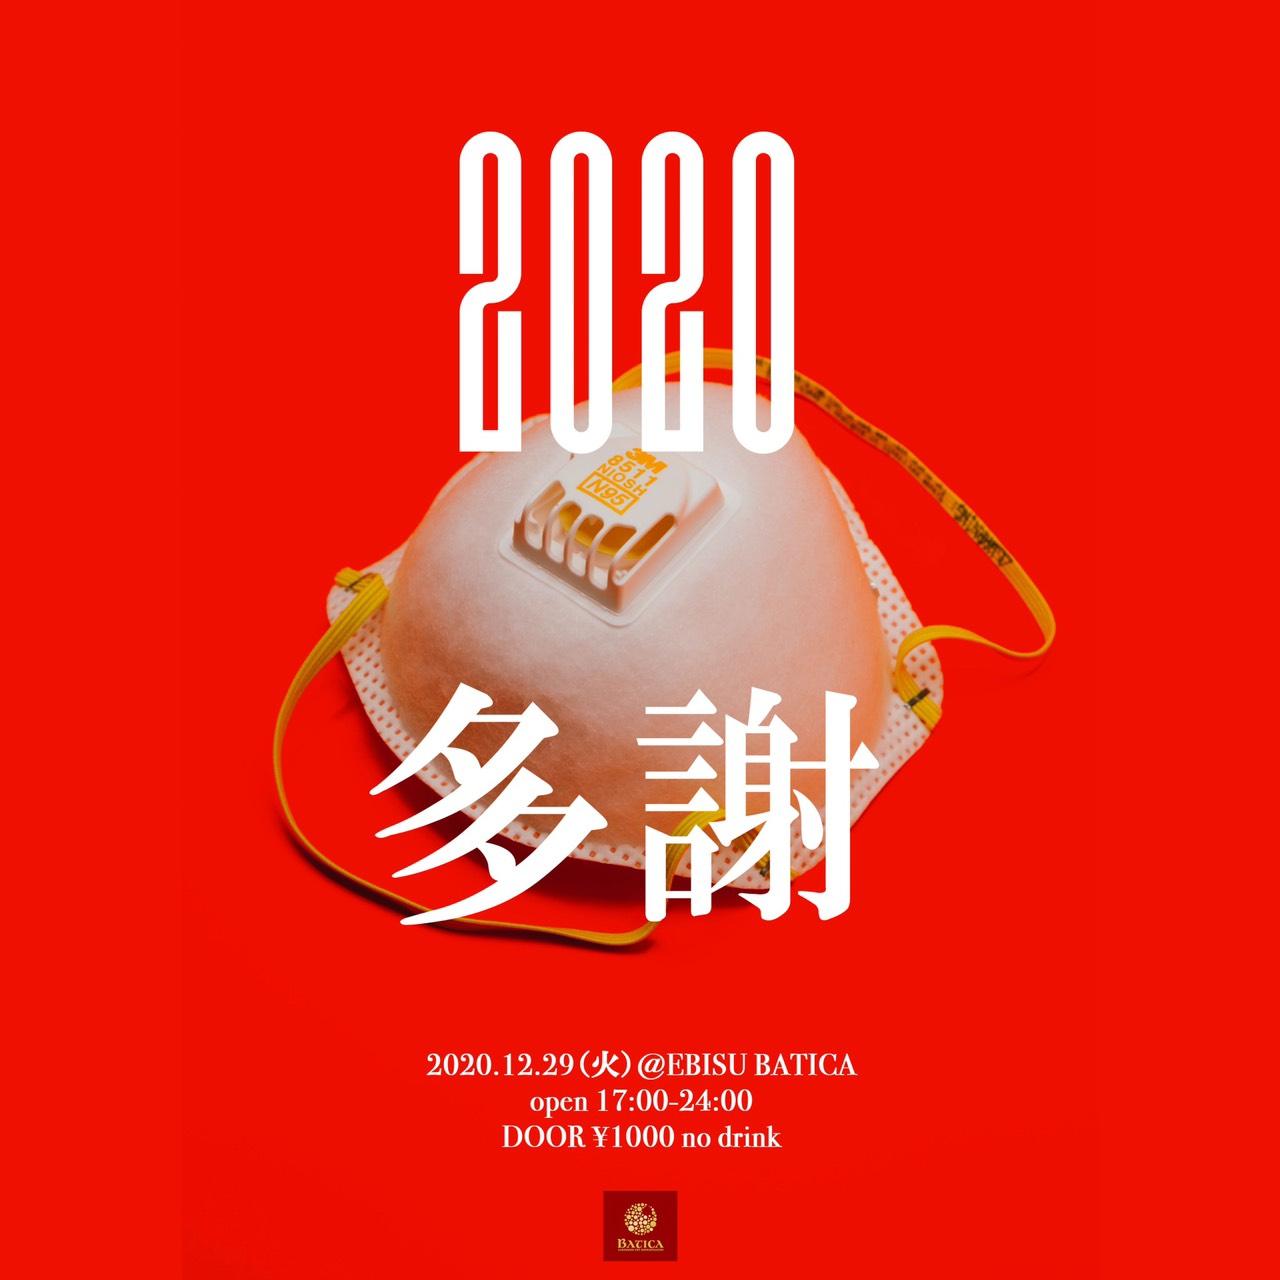 12/29(火)恵比寿batica 2020多謝